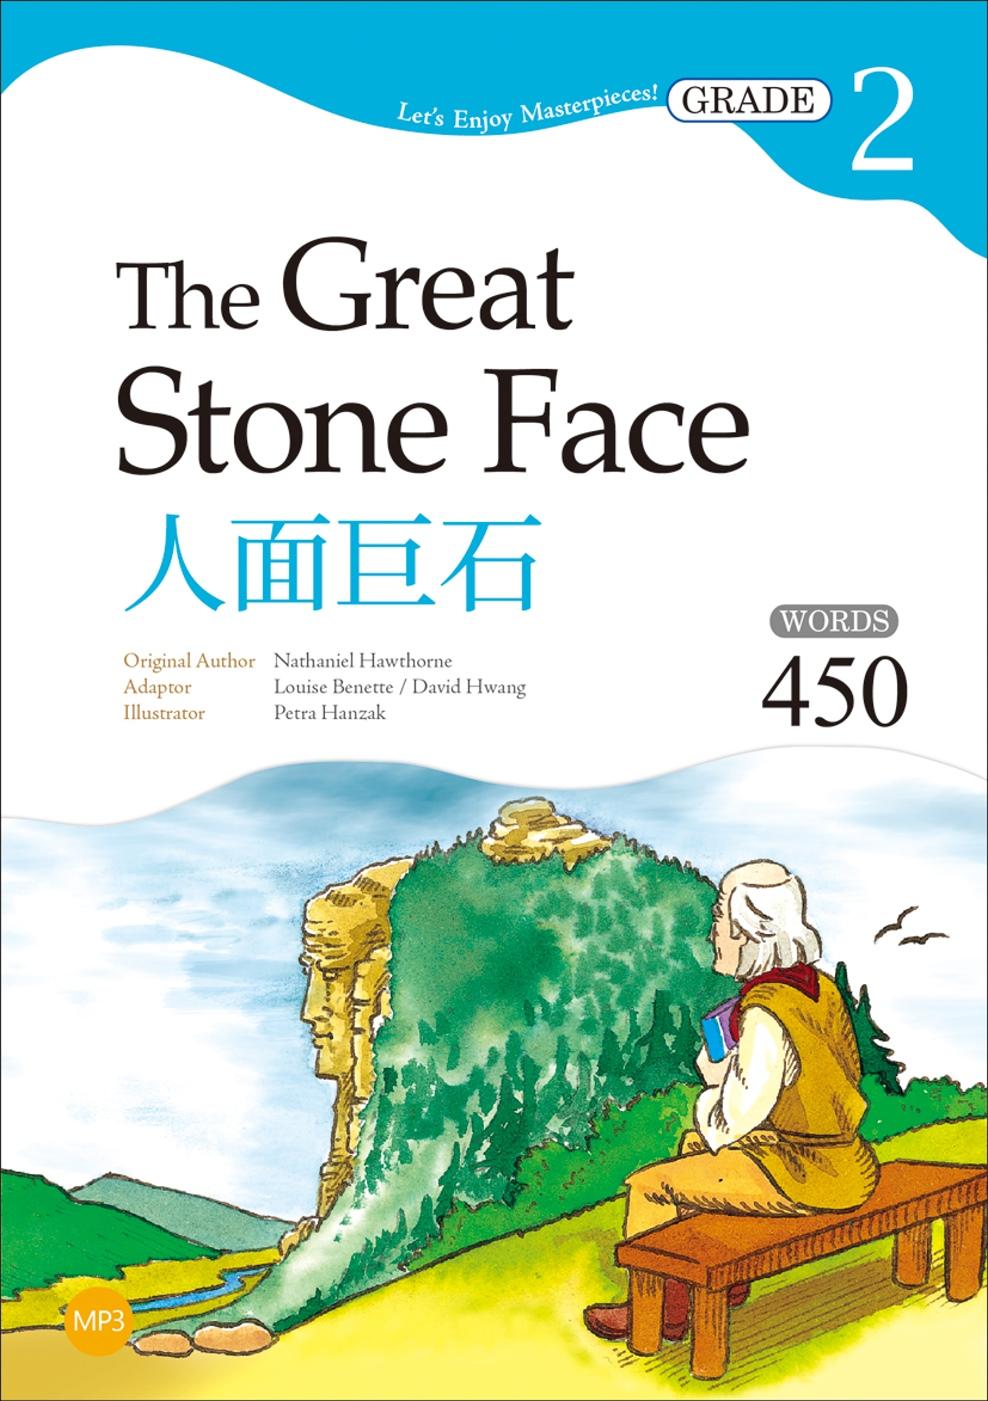 人面巨石 The Great Stone Face【Grade 2經典文學讀本】(二版)(25K+1MP3)